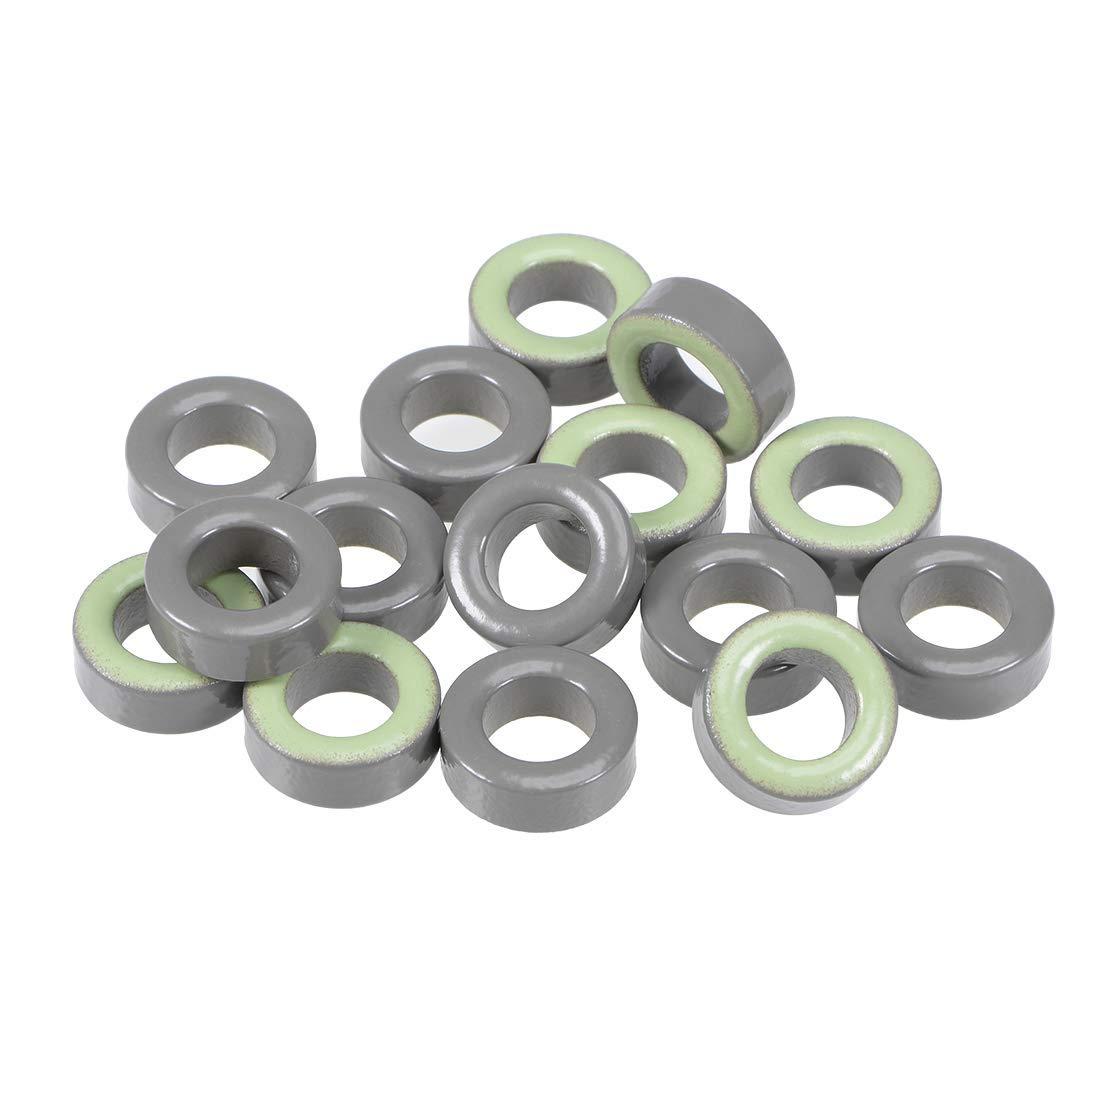 ZCHXD 15pcs 7.4 x 13.3 x 5mm Ferrite Ring Iron Powder Toroid Cores Gray Light Green